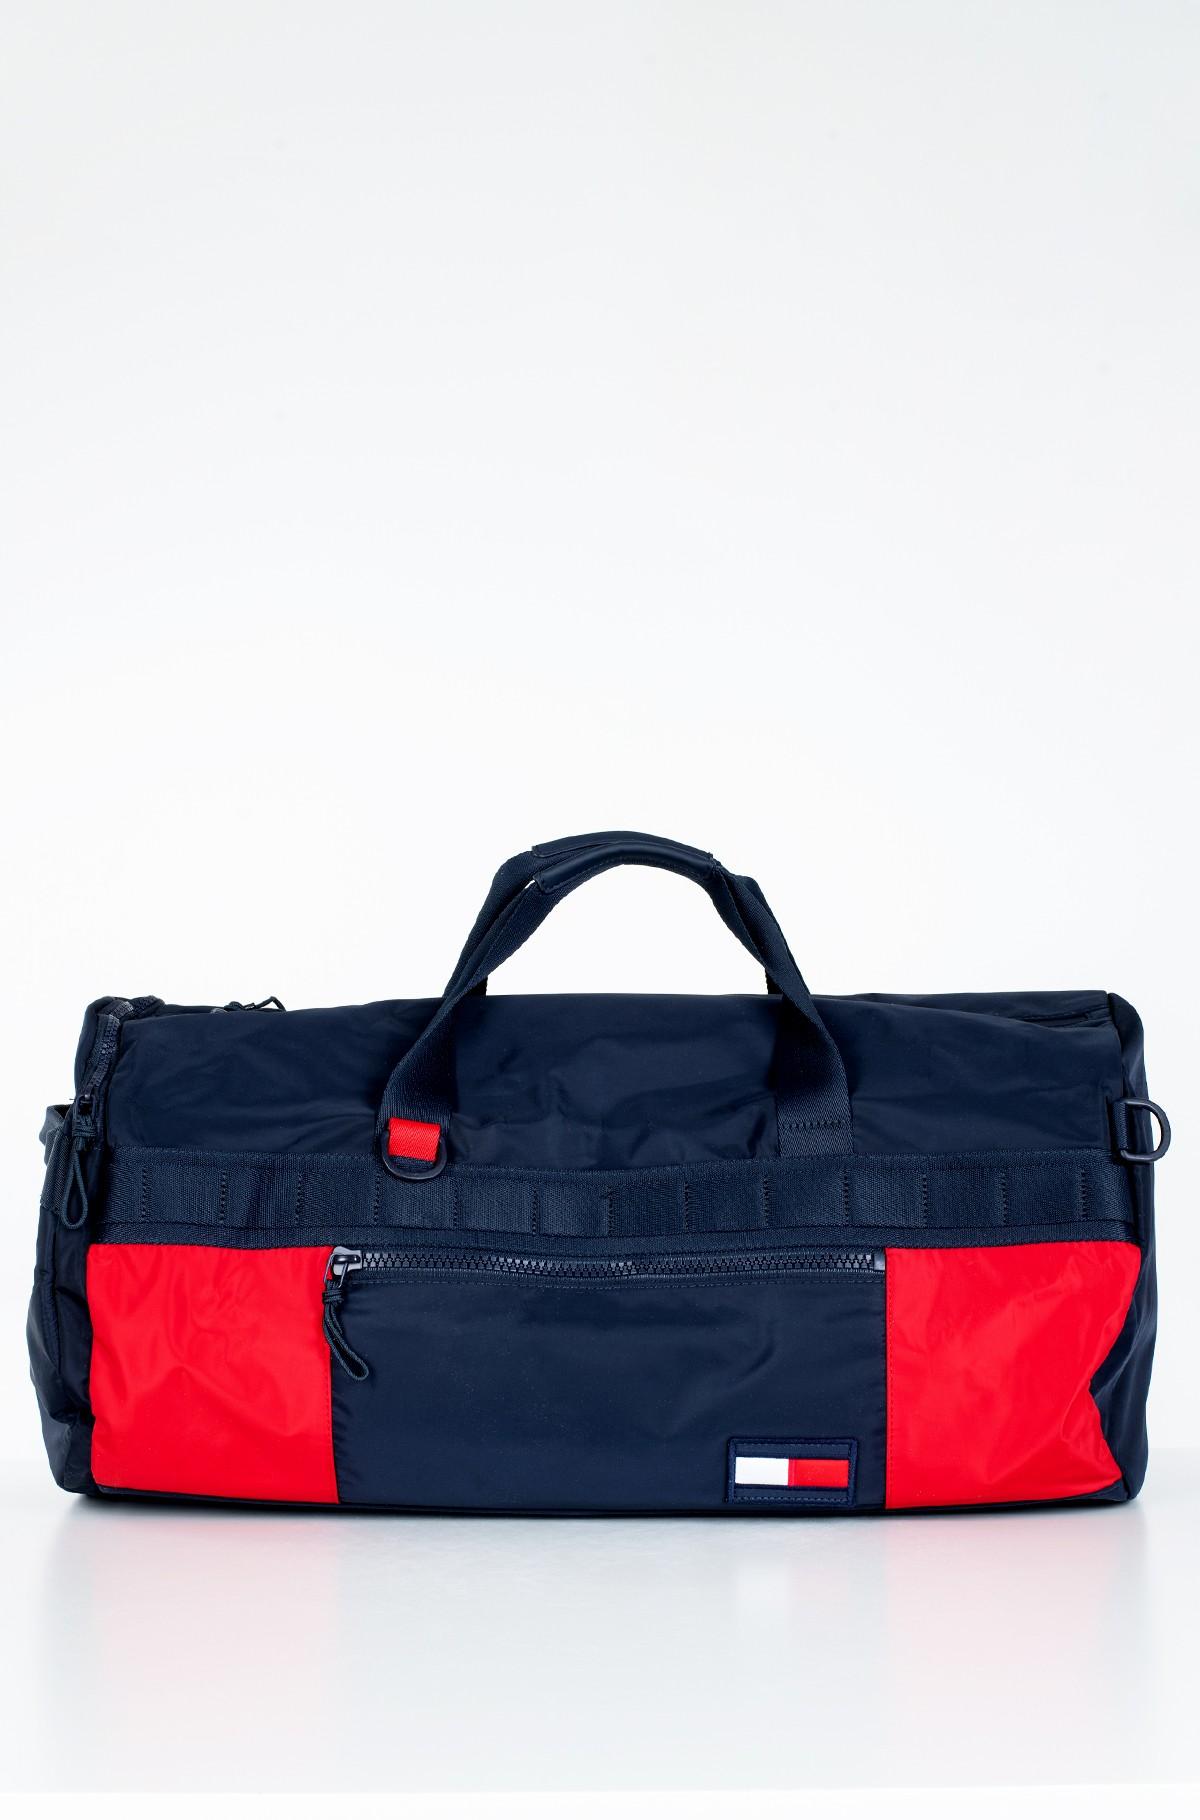 Kelioninis krepšys  TOMMY CONVERTIBLE DUFFLE-full-1